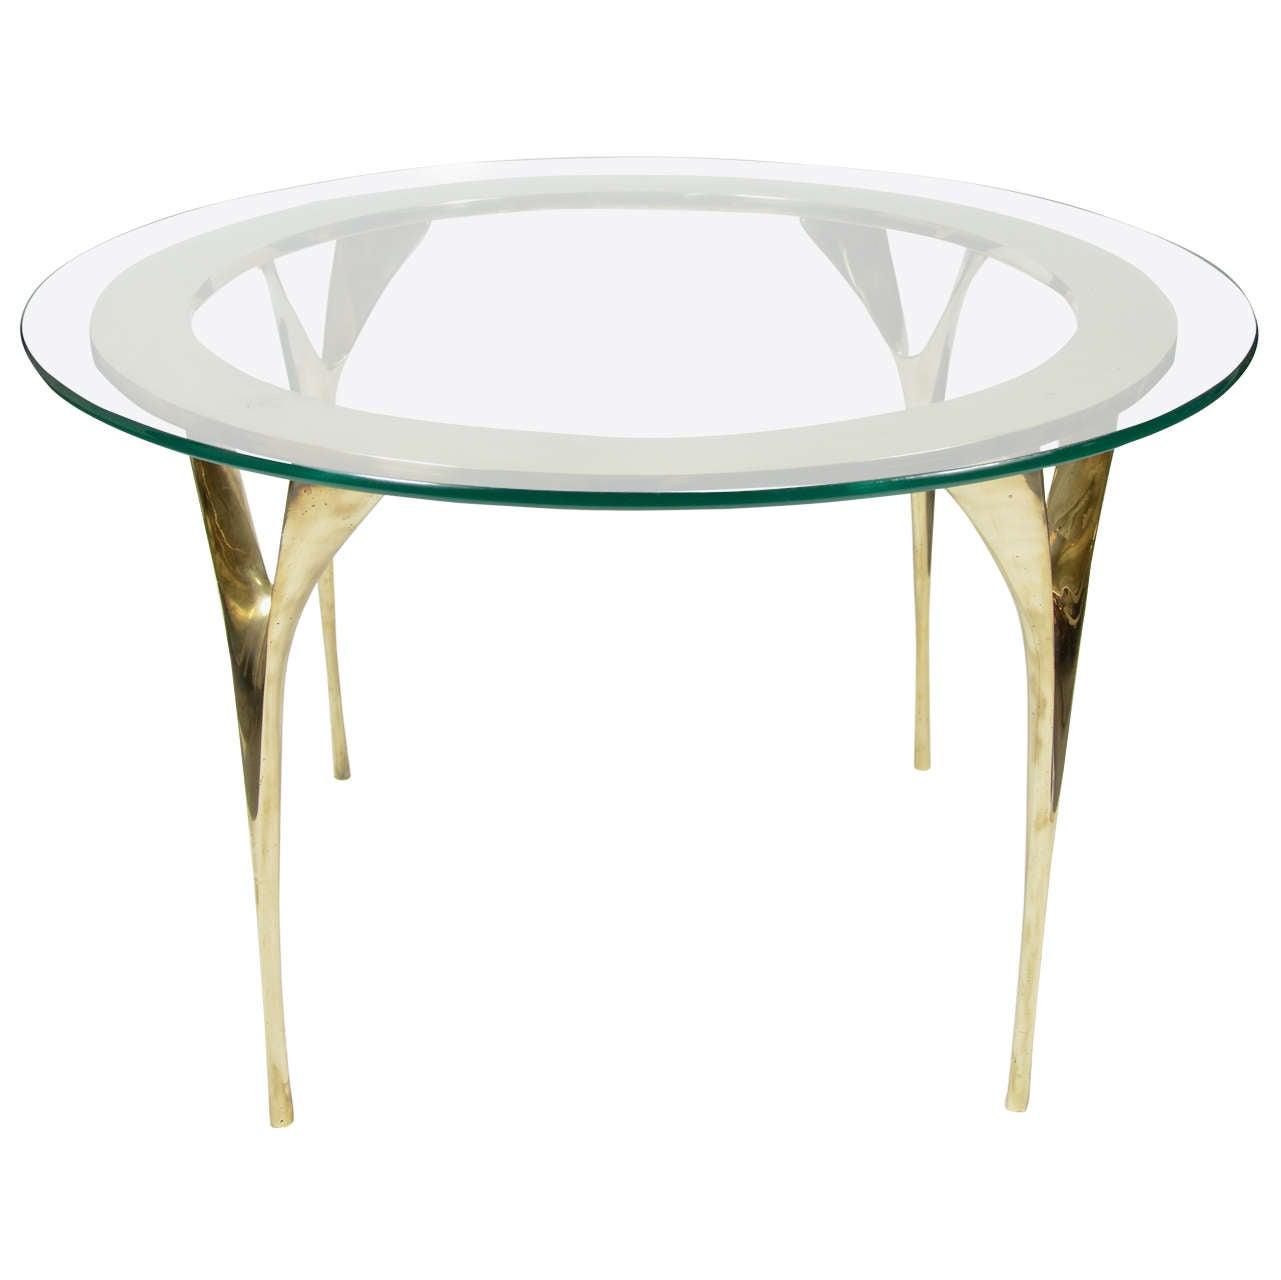 Coffee Table Leg Broken: Modernist Sculptural Brass Stiletto Leg Cocktail Table At